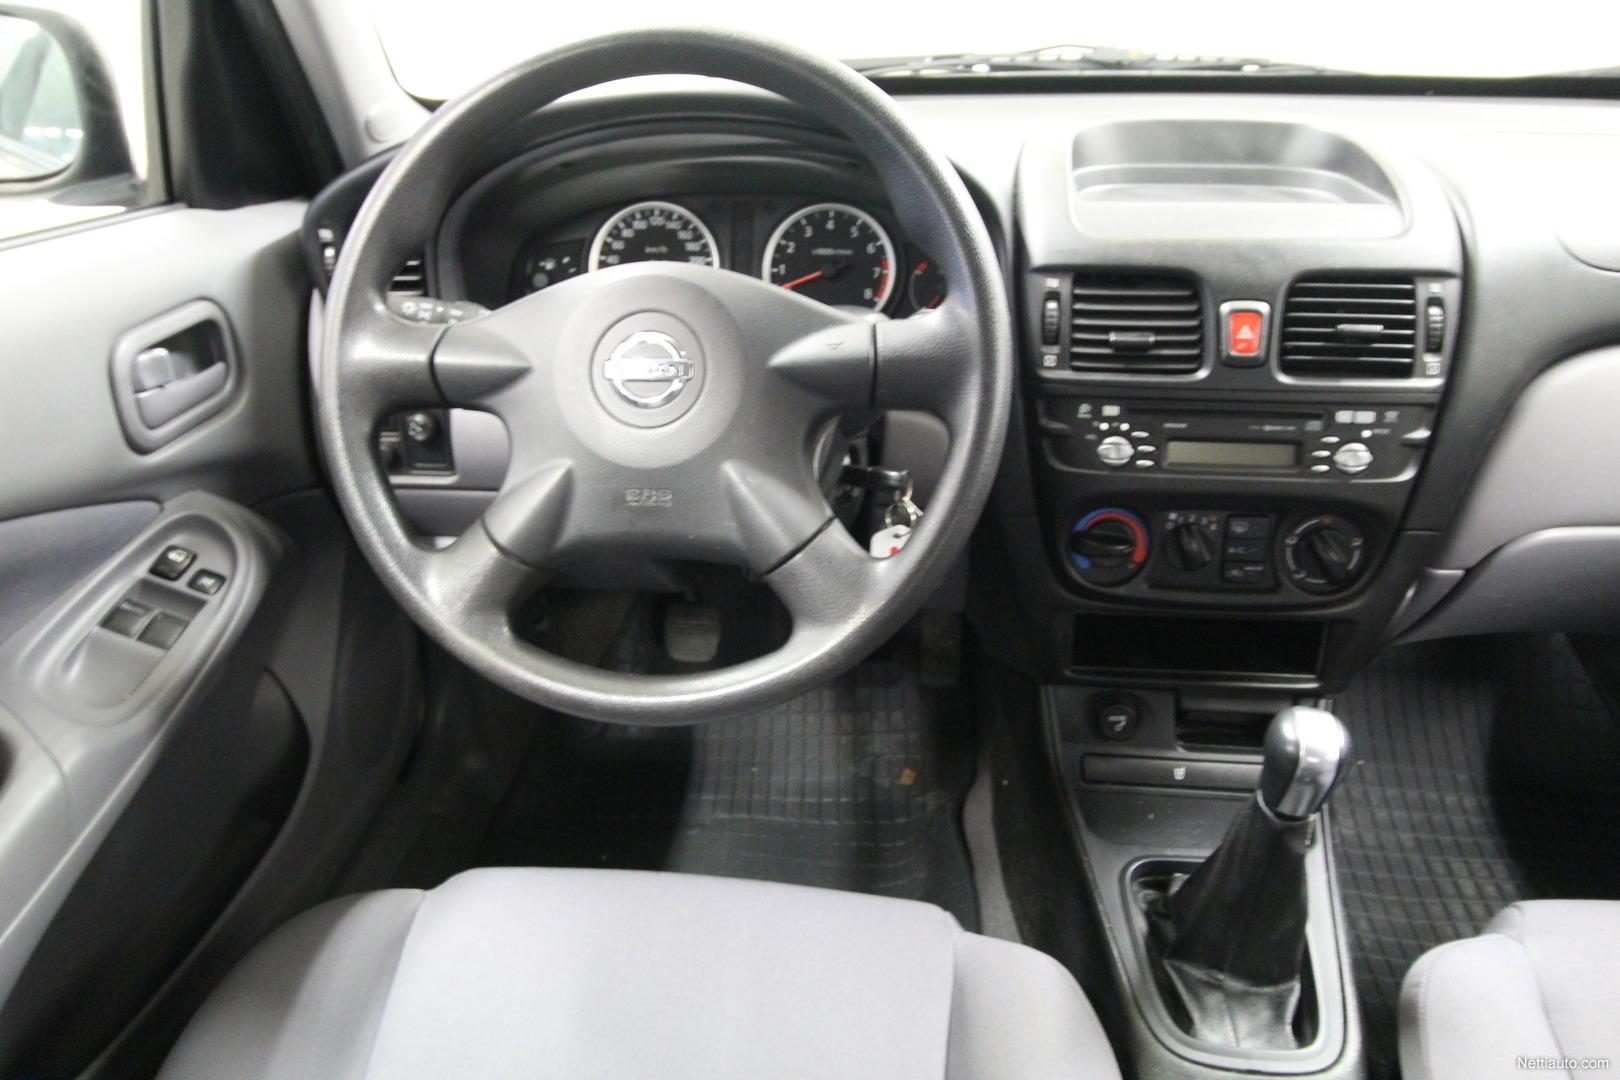 Nissan Almera 15 Visia 4d Vhn Ajettu Helmi Ilmastoitu Nismo Black Previous Next